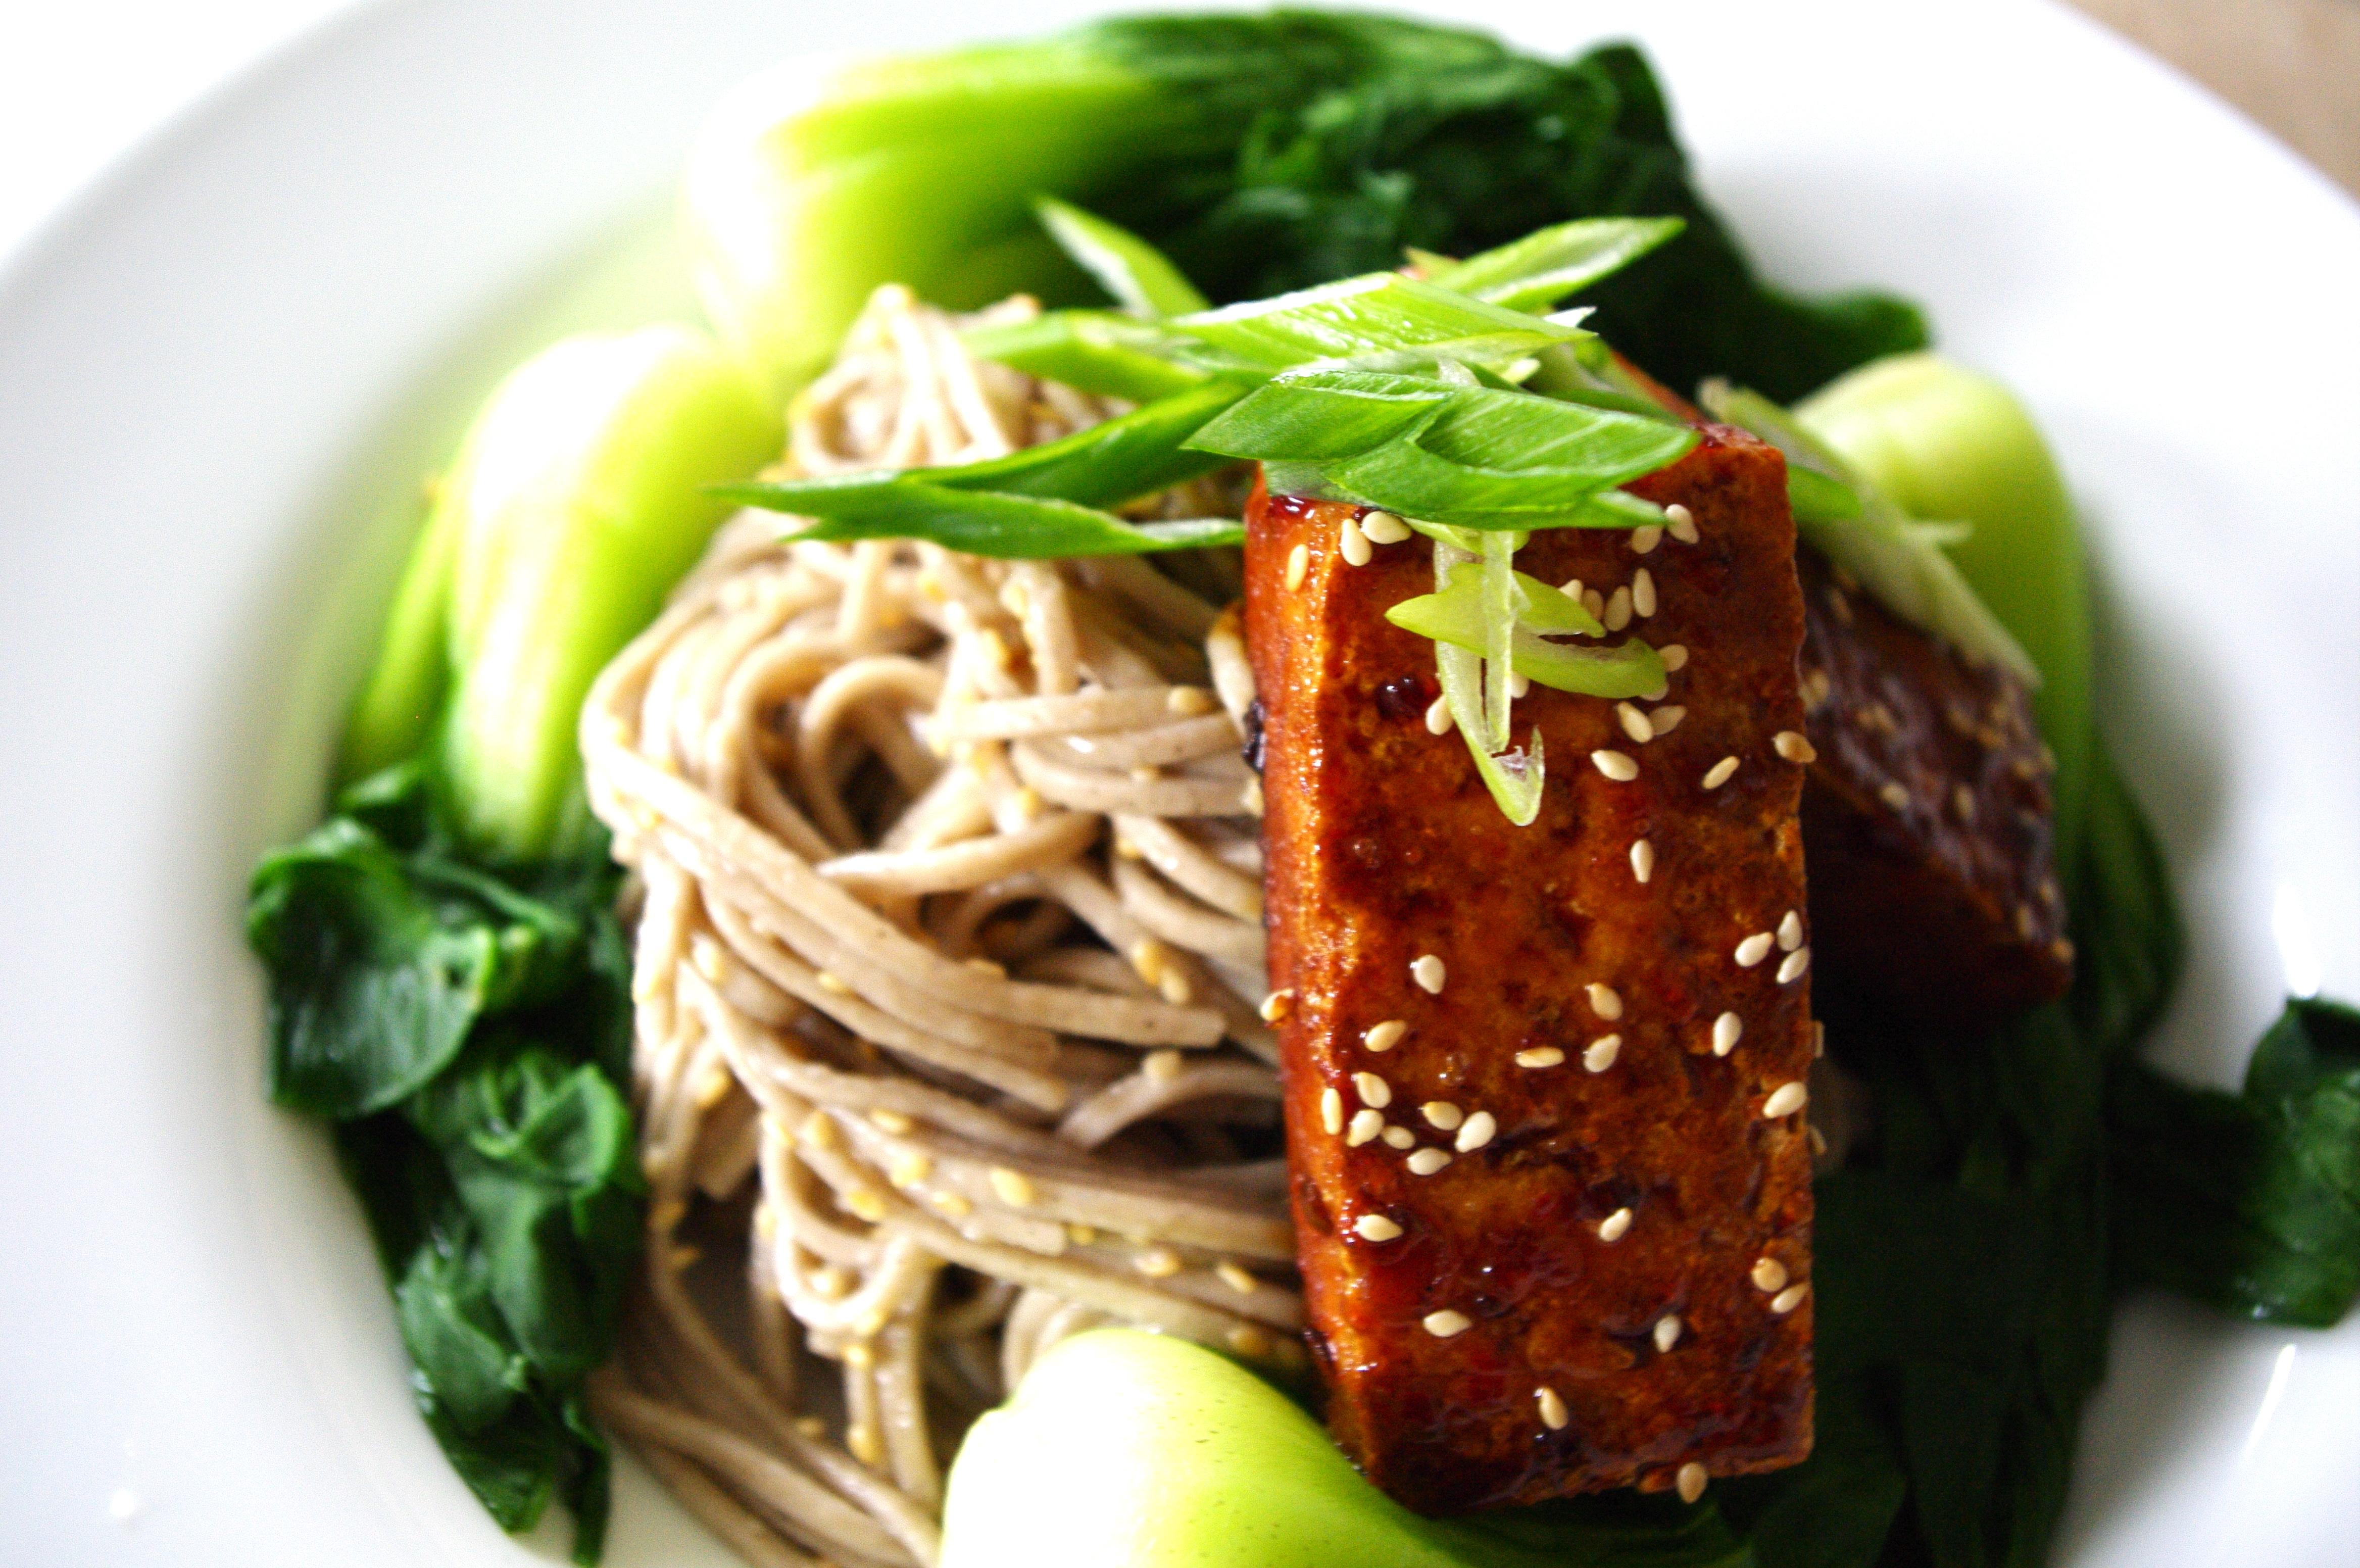 Tofu And Soba Noodles With Lemon Ginger Dressing Recipes — Dishmaps